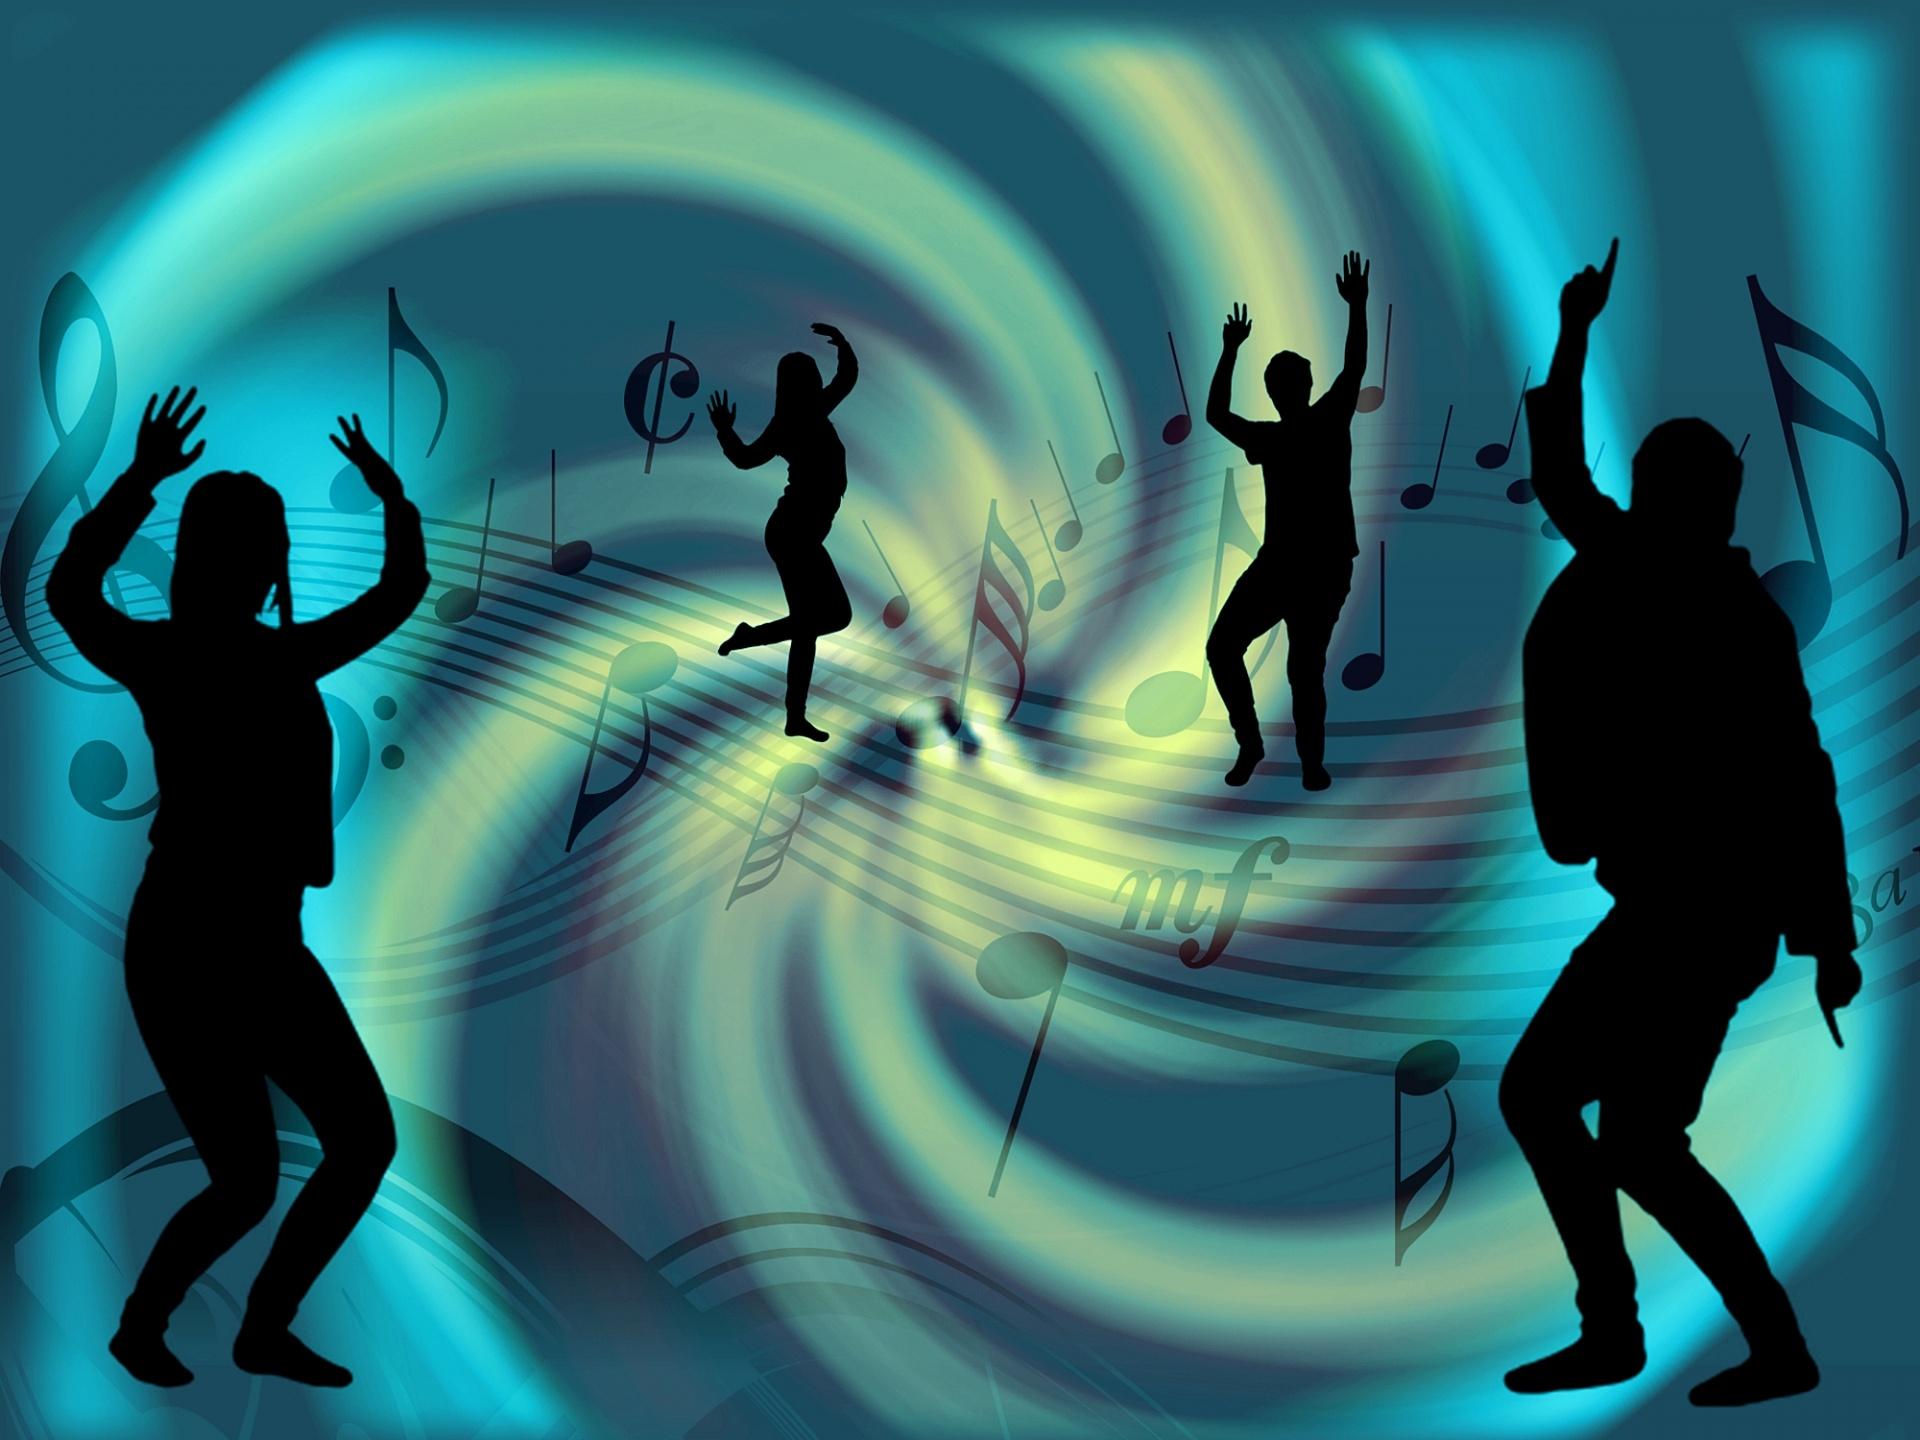 Background,music,dance,fun,joy - free photo from needpix com